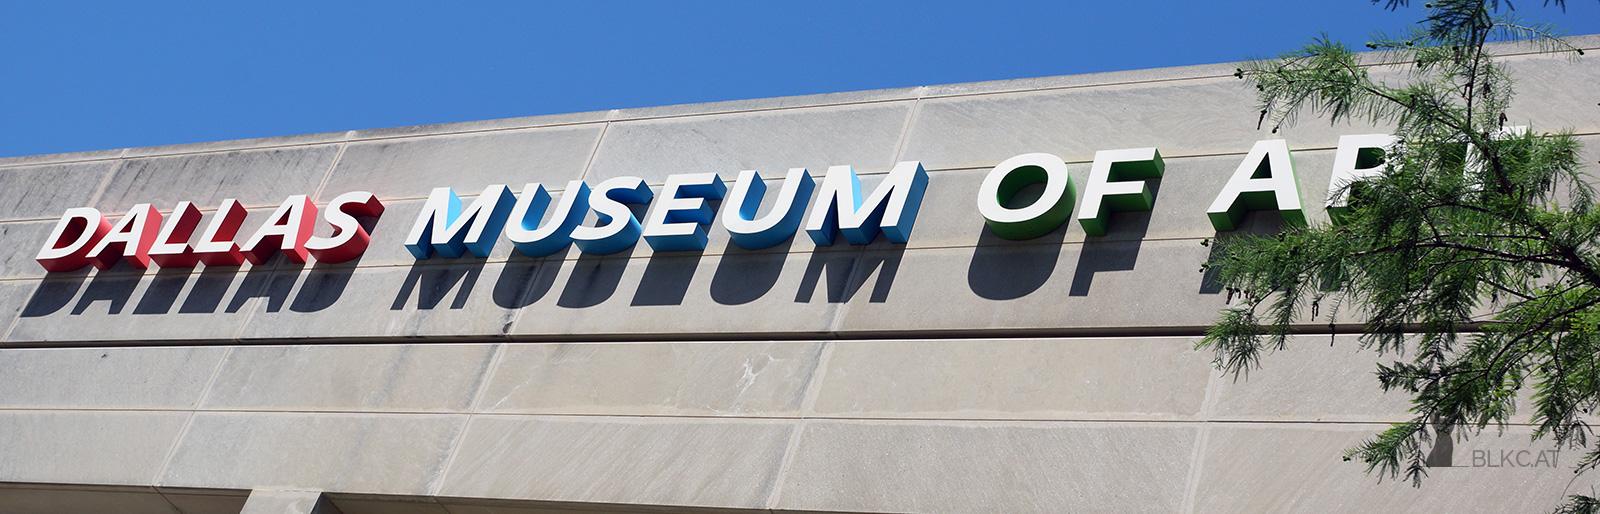 Dallas-Museum